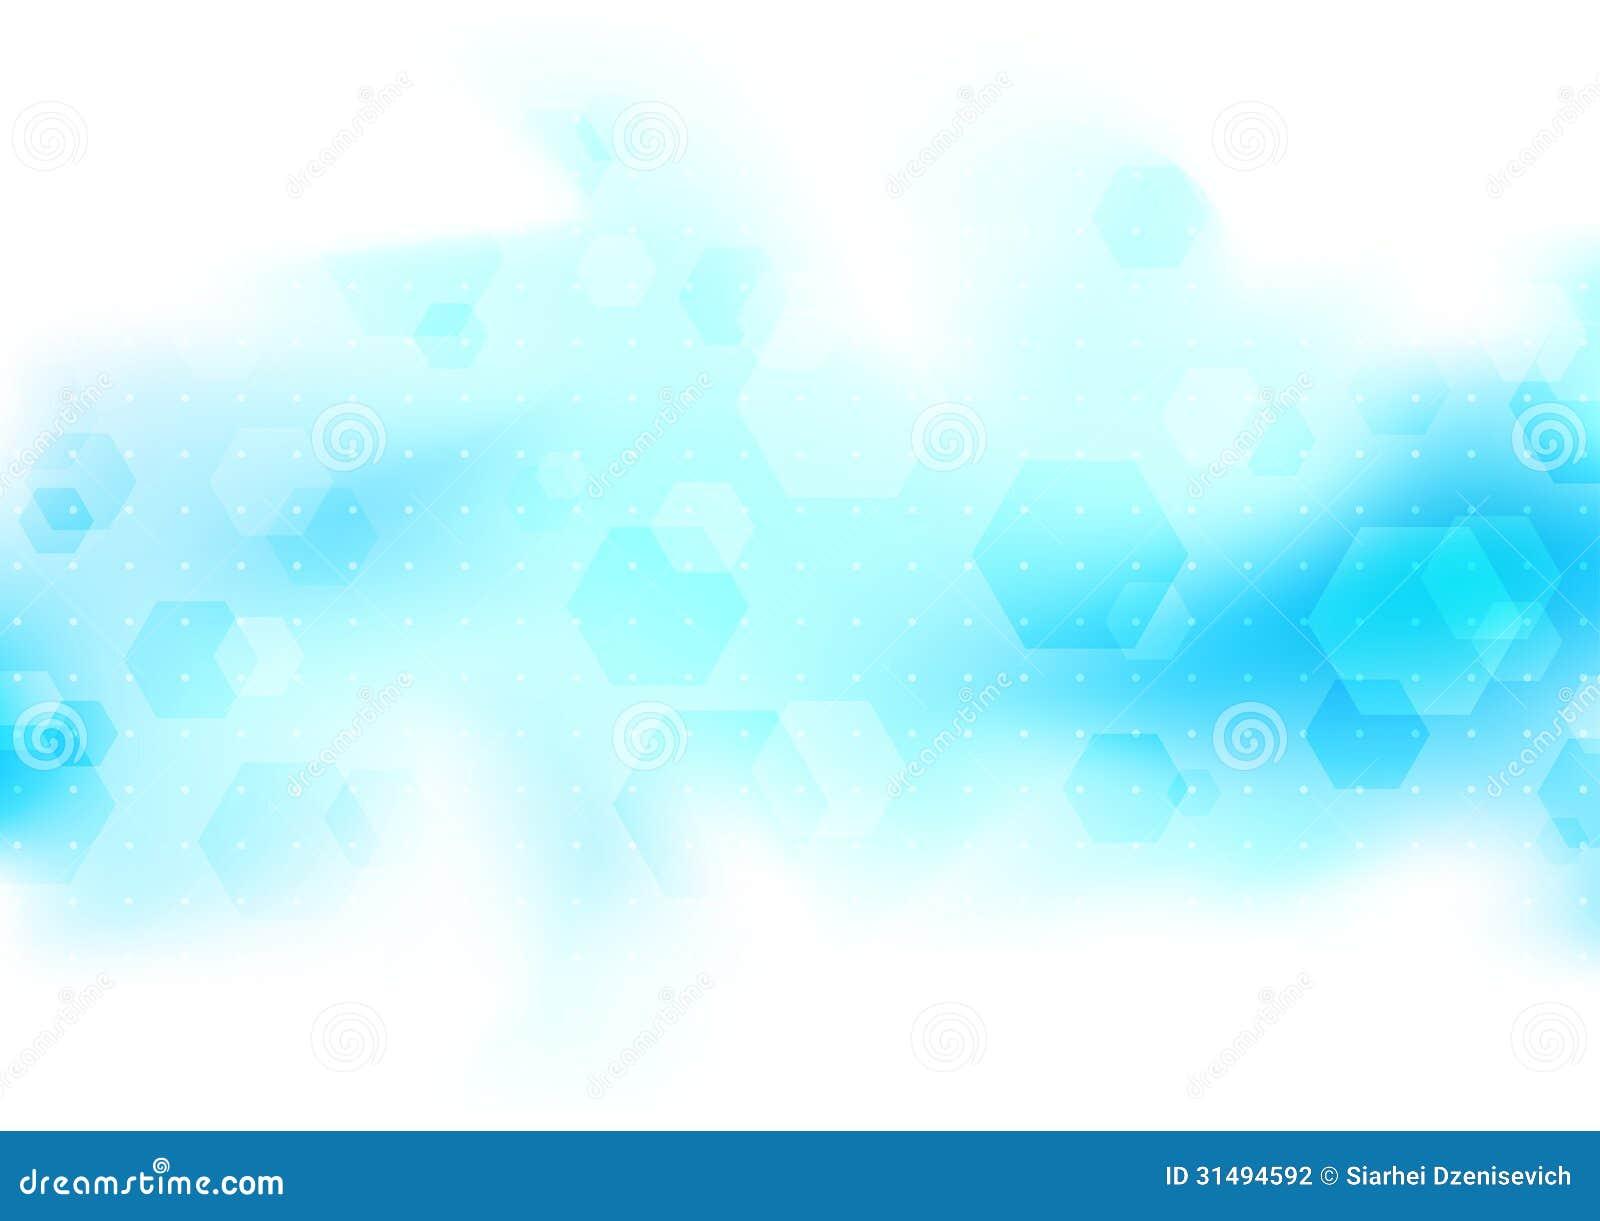 Transparent Modern Background Template - 154.0KB